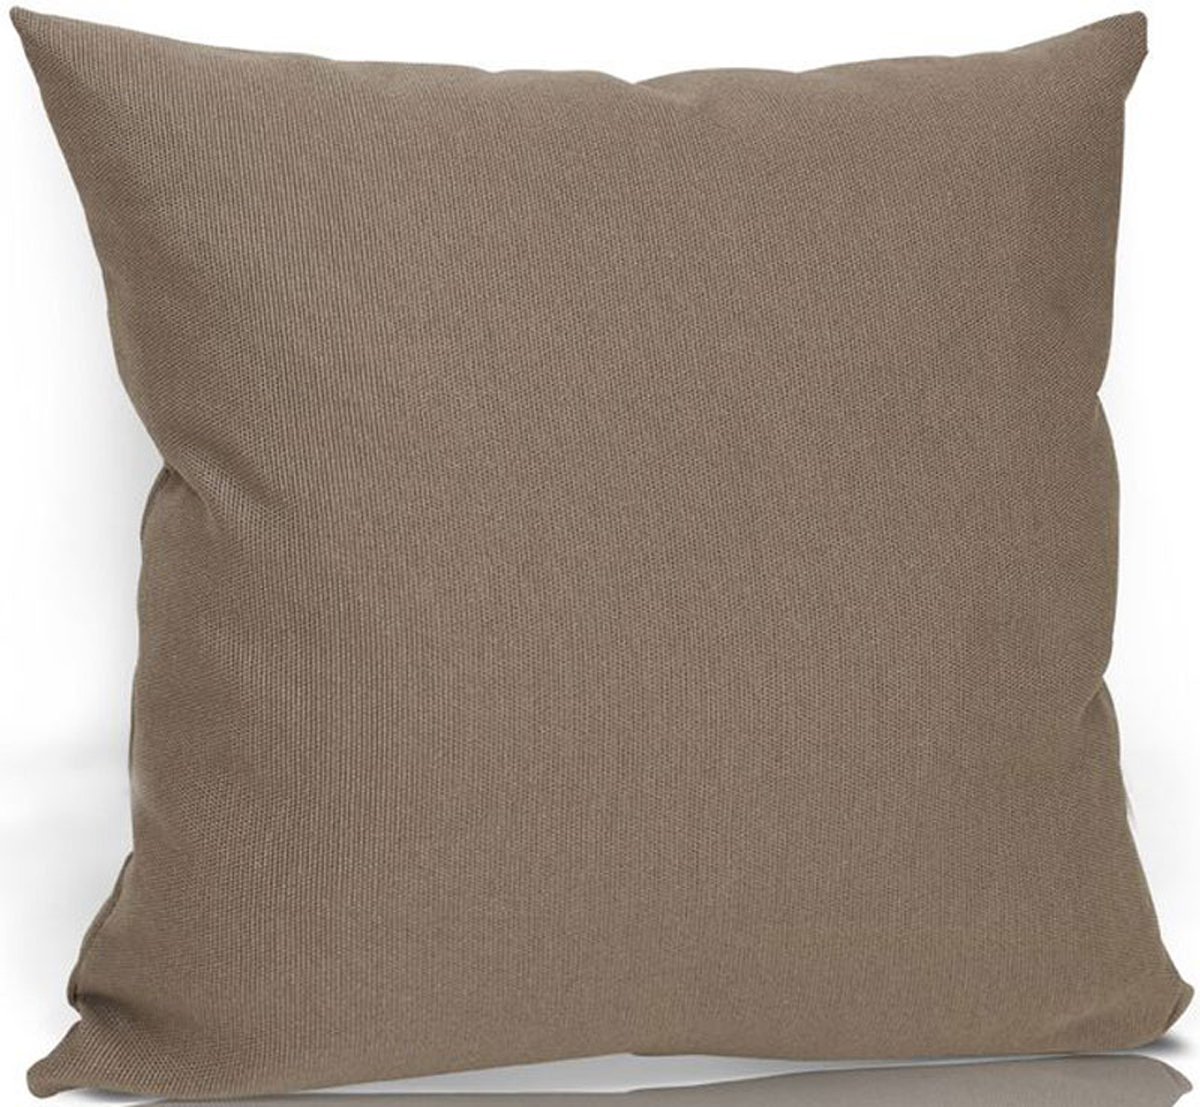 Подушка декоративная KauffOrt Натур, цвет: светло-коричневый, 40 х 40 см штора легкая kauffort barolo